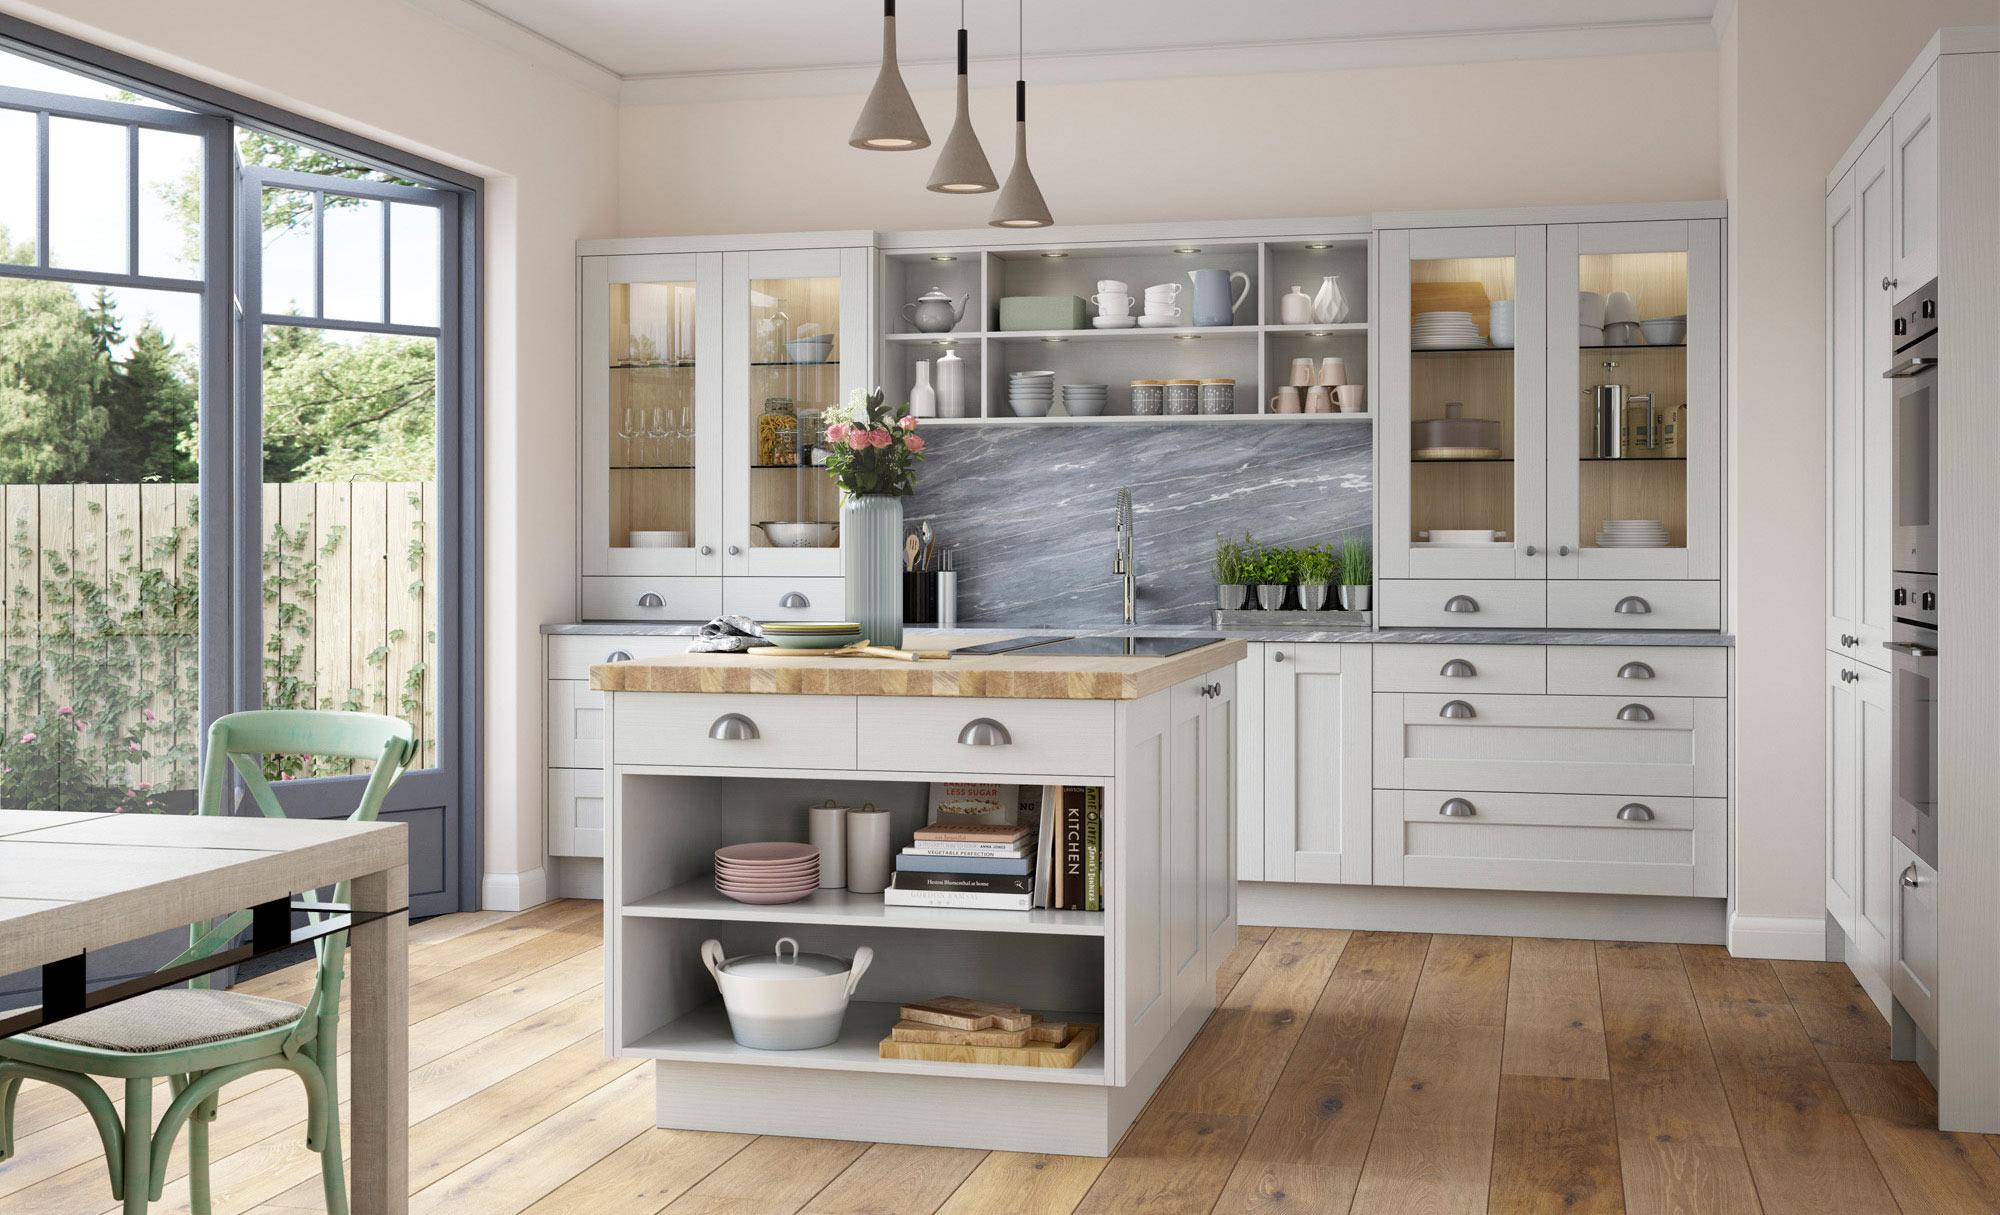 Uform Kensington Light Grey  Kitchen